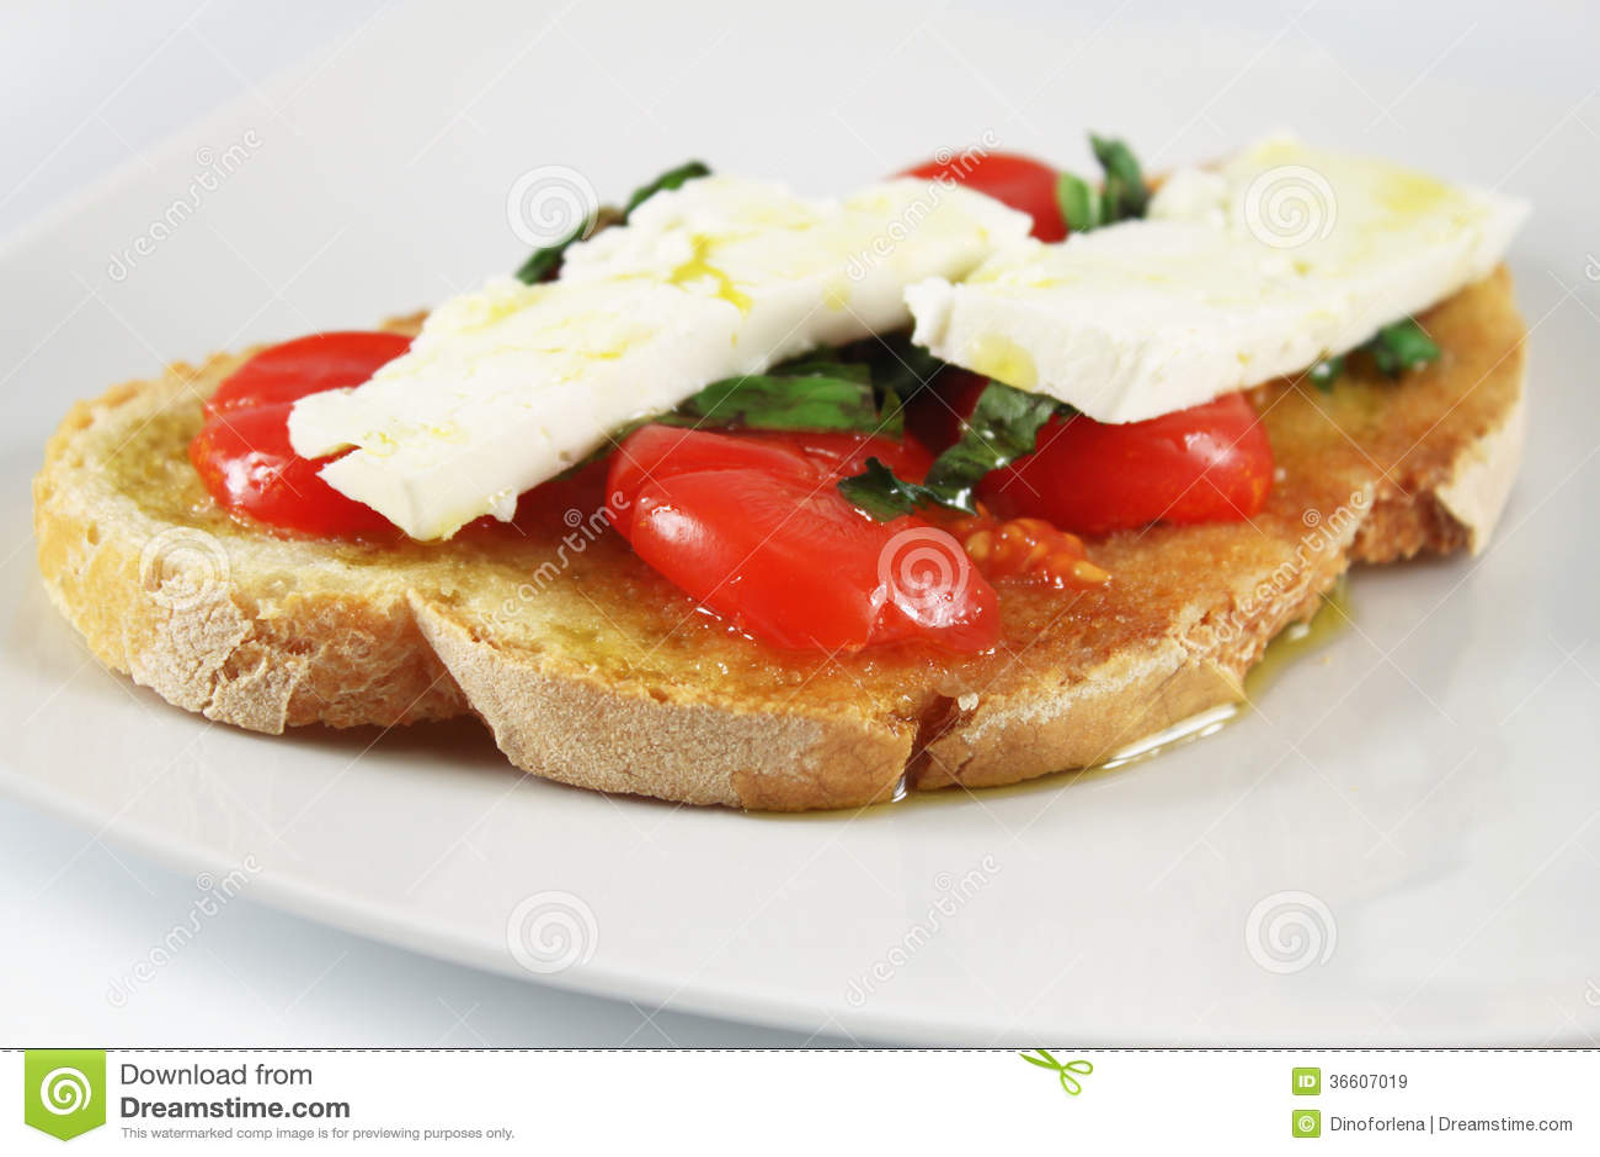 ... tomatoes and mozzarella bruschetta with tomatoes mozzarella and olives